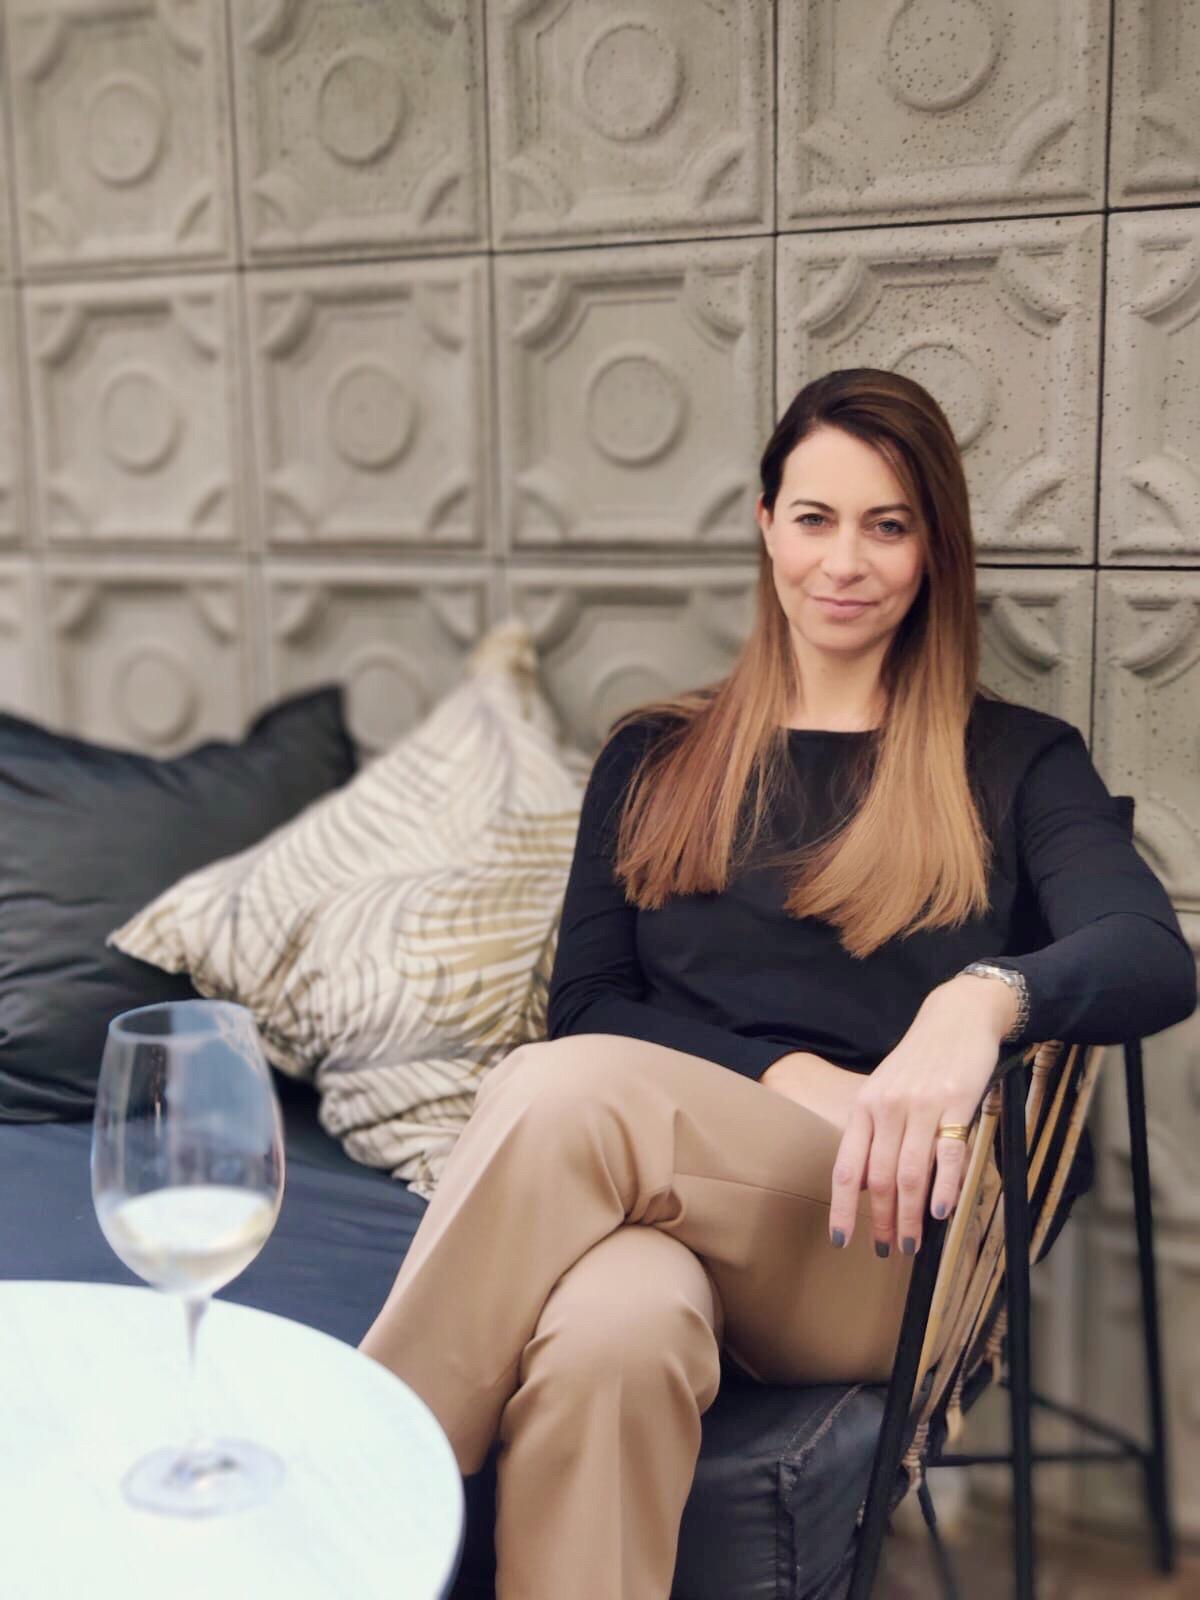 פאולה לטרובסקי | סטייליסטית אישית, סטיילינג אישי 2 סטייליסטית אישית